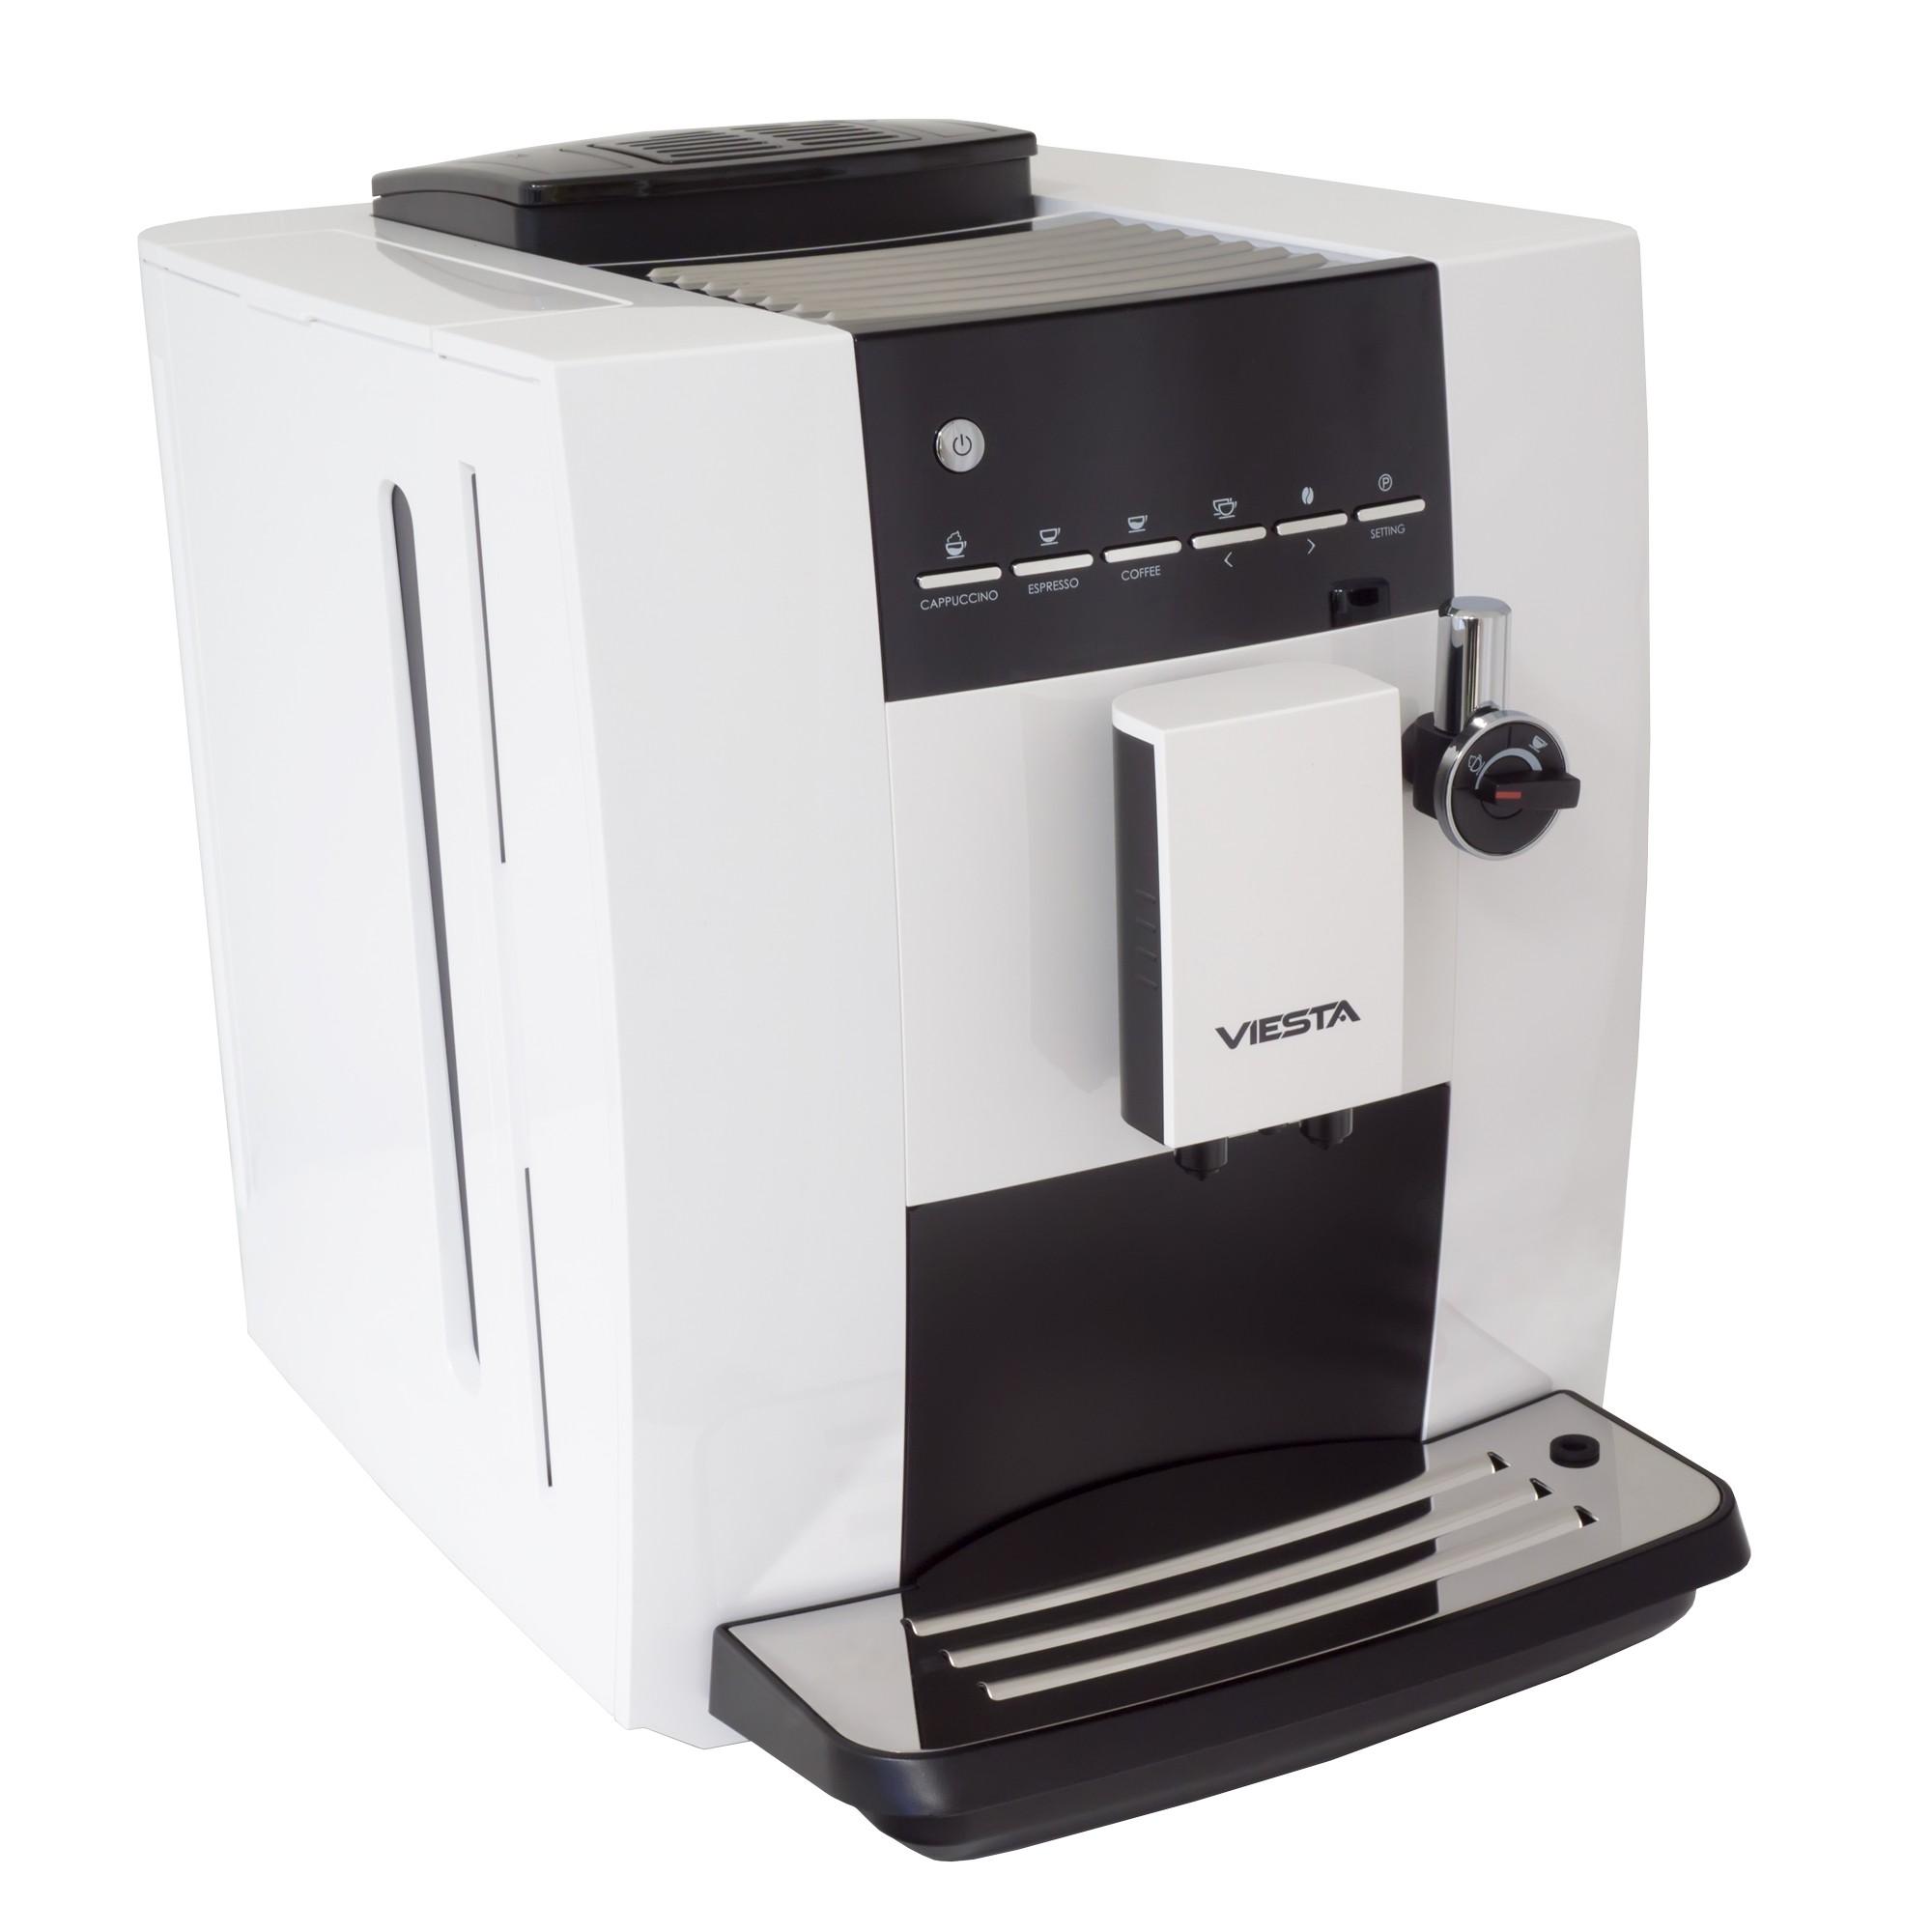 Coffee Maker Coffee Powder : Viesta CB350 PLUS Fully automatic coffee machine - for coffee beans or powder eBay